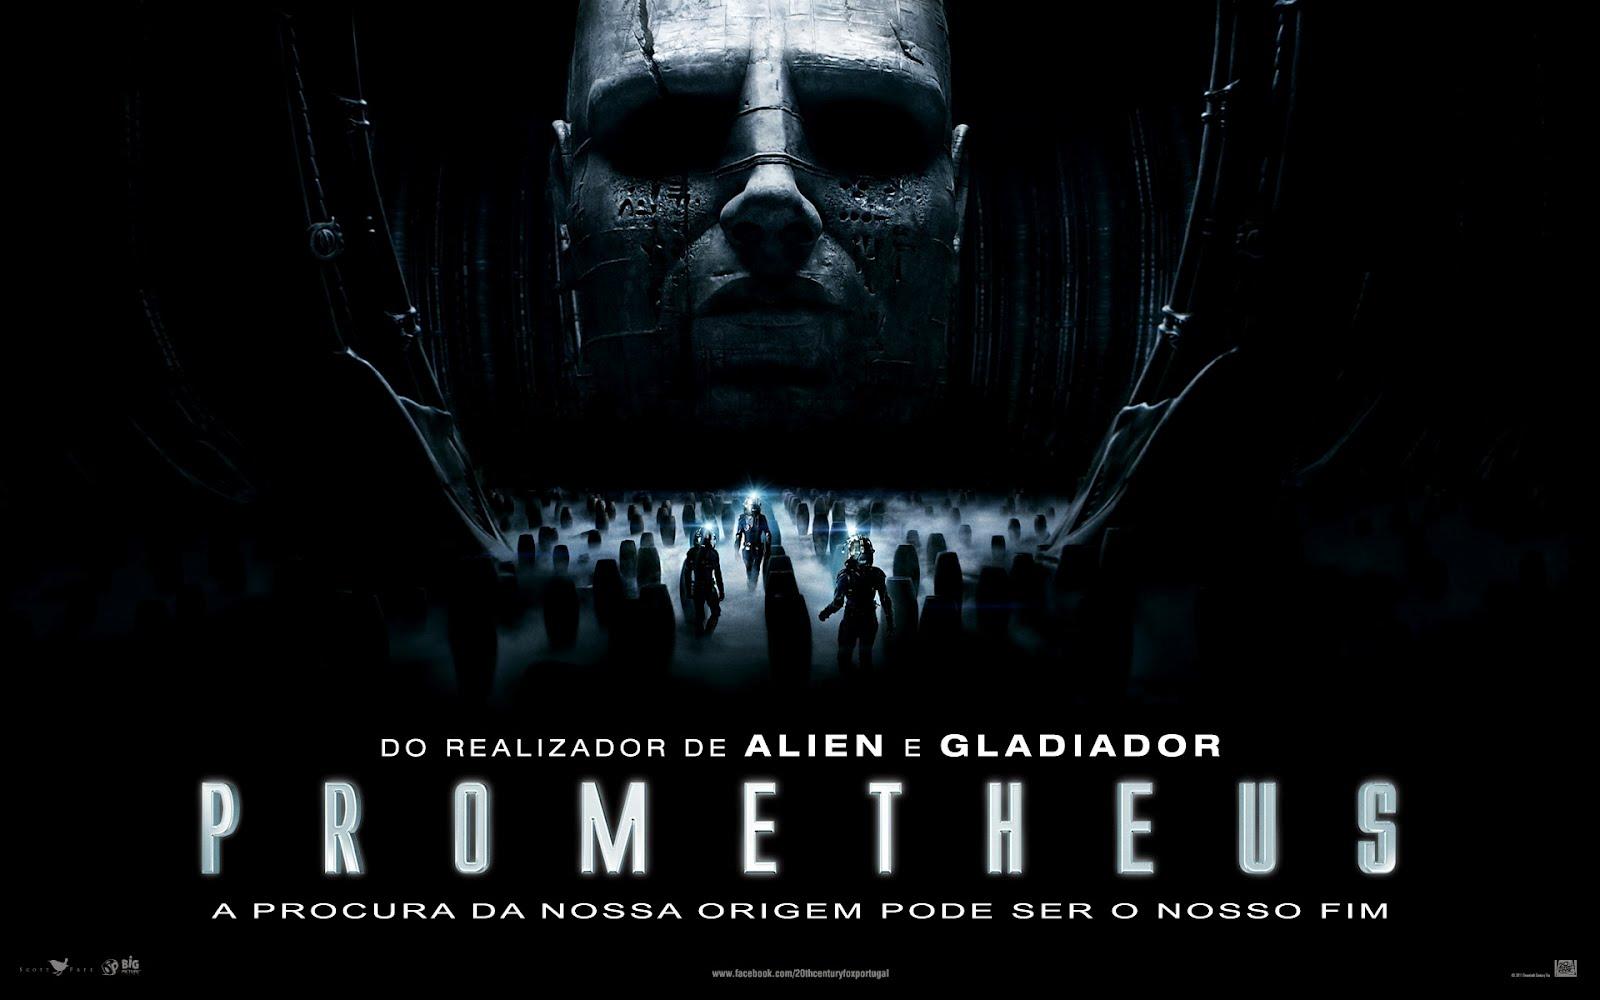 http://4.bp.blogspot.com/-w1Rsq769G7k/T9Xig-WpSyI/AAAAAAAAhvY/xxbWvqZISj0/s1600/Prometheus-HD-movie_1920x1200.jpg